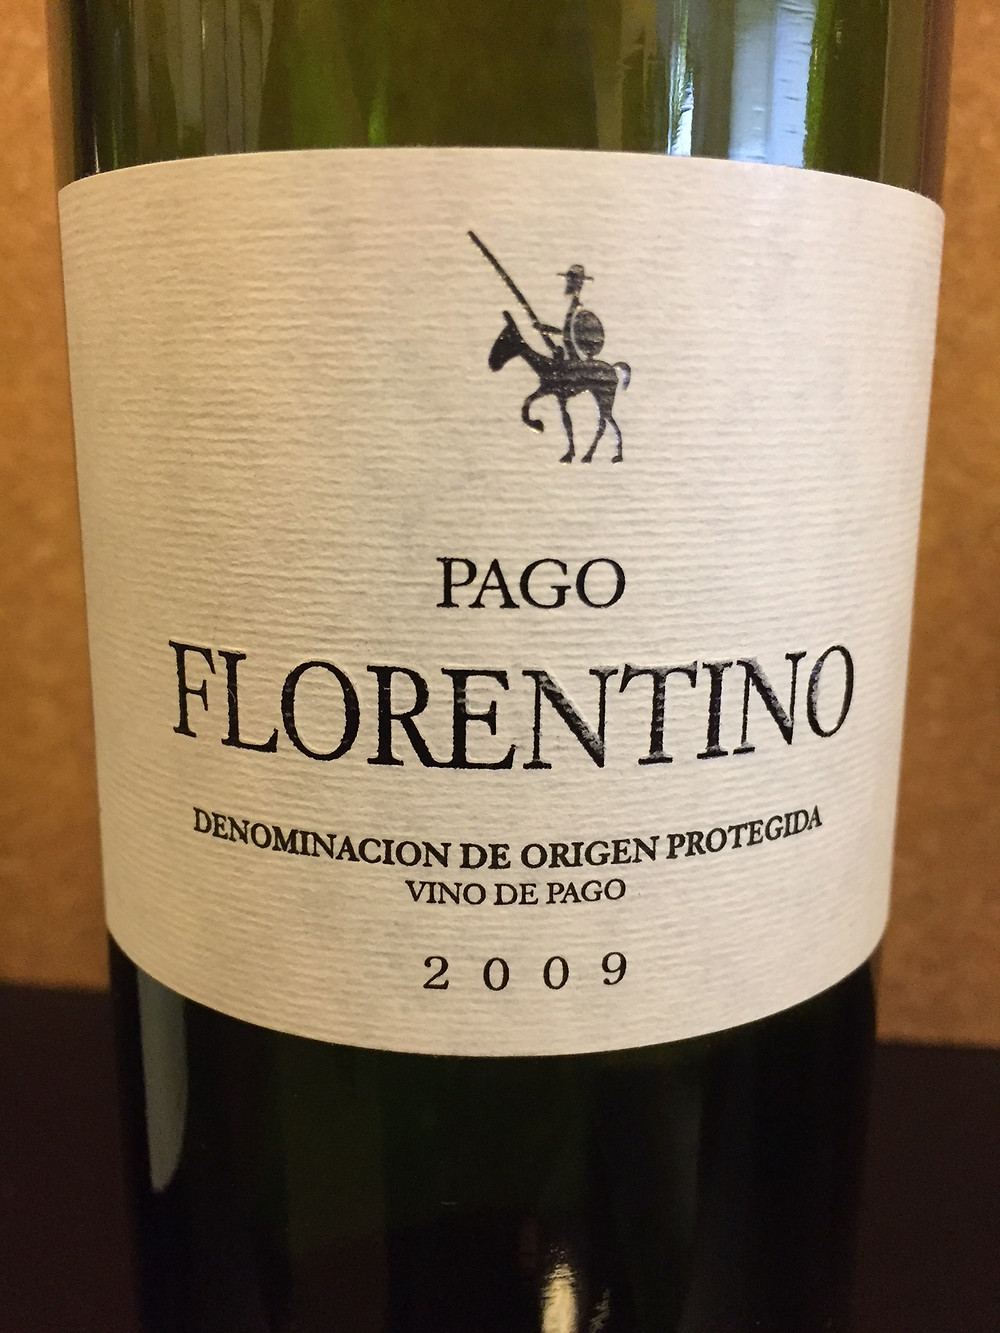 pago florentino 2009